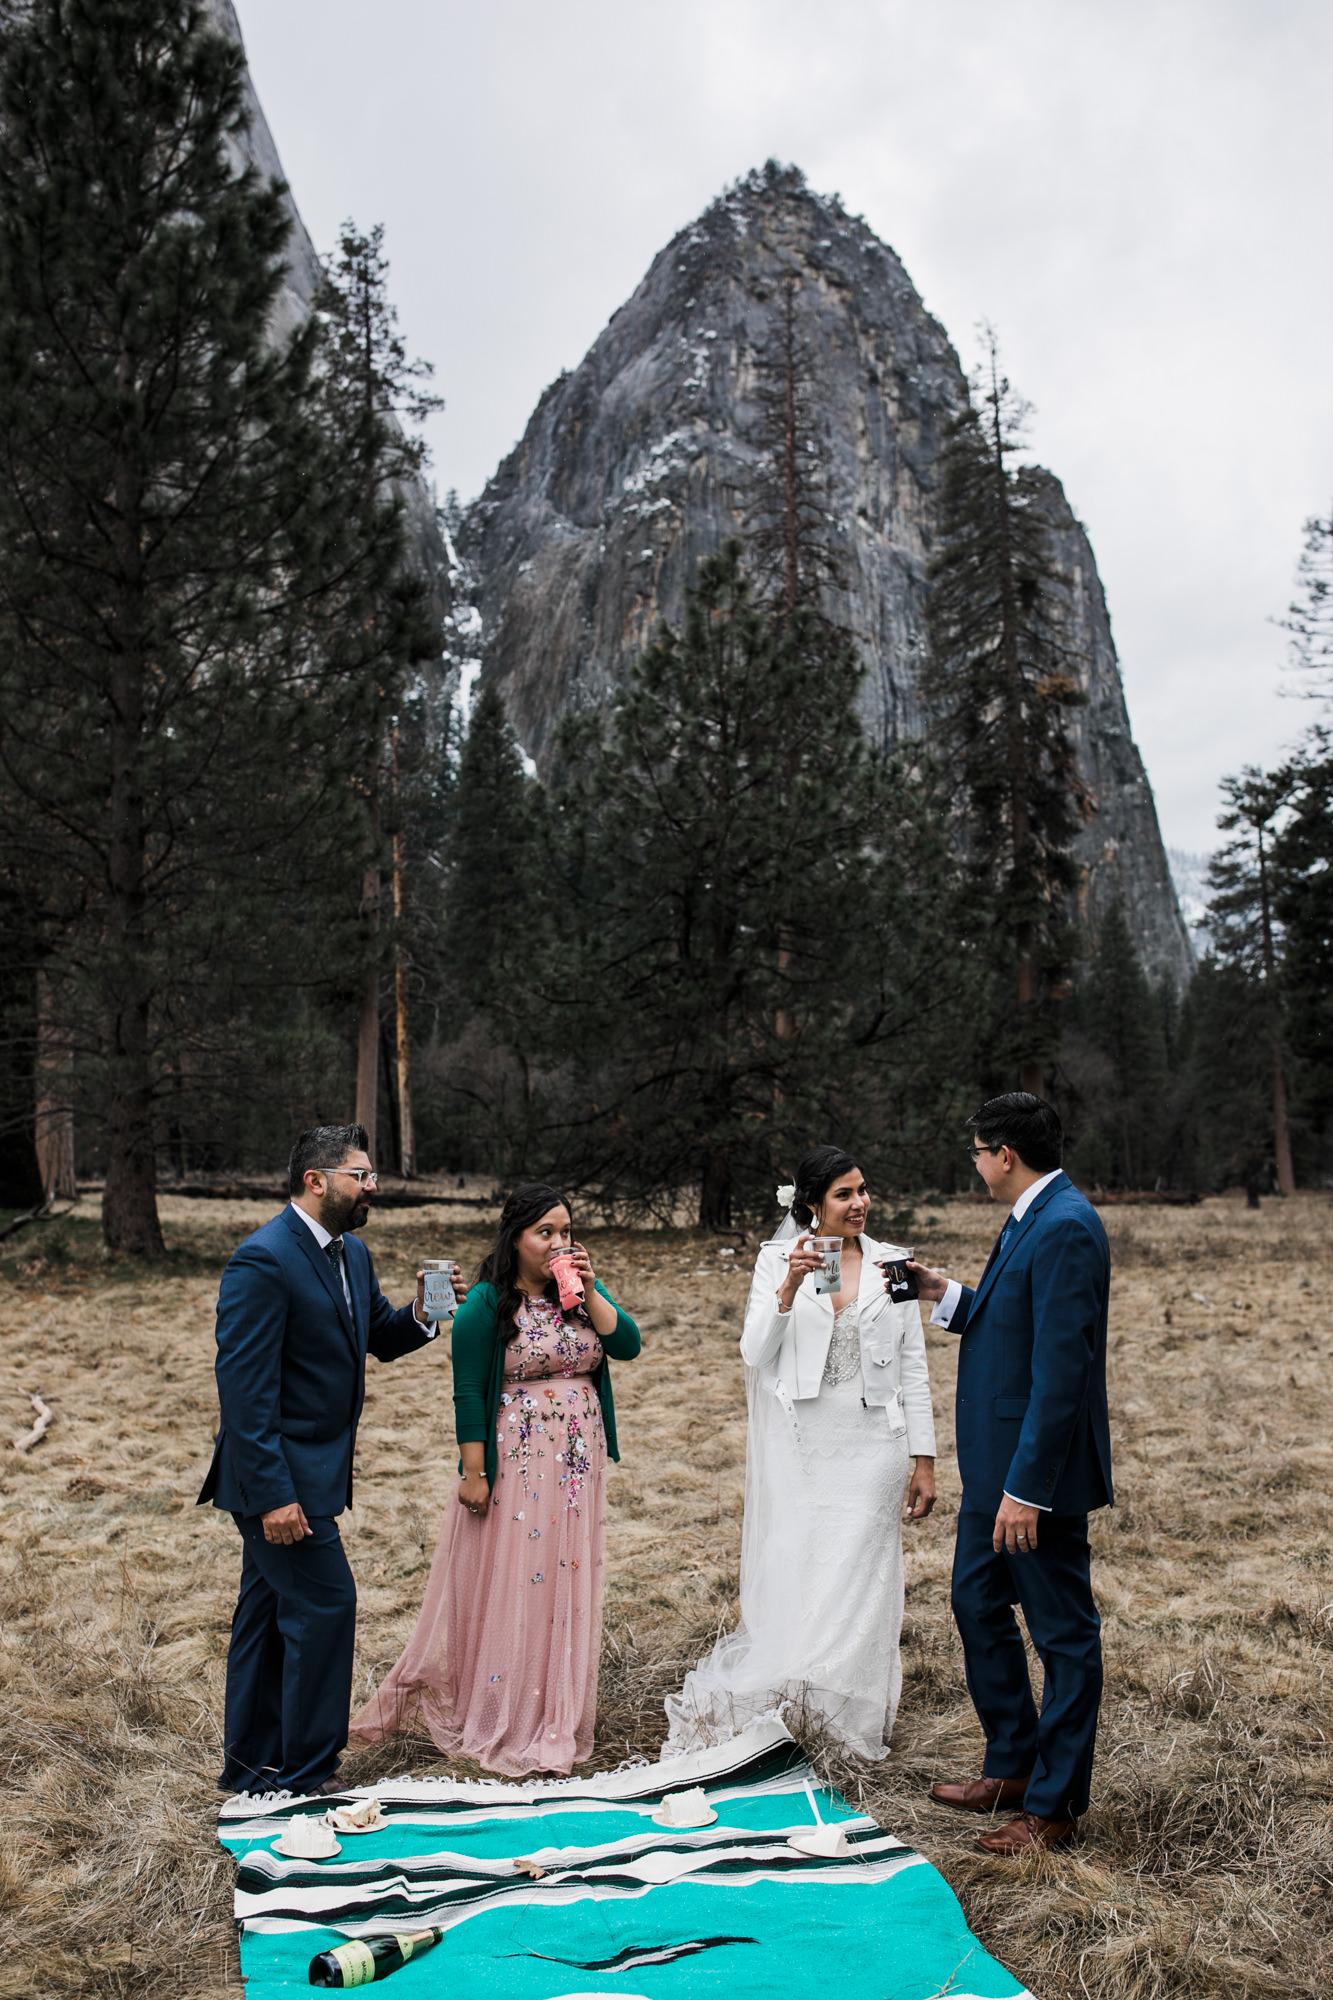 wedding picnic in yosemite national park